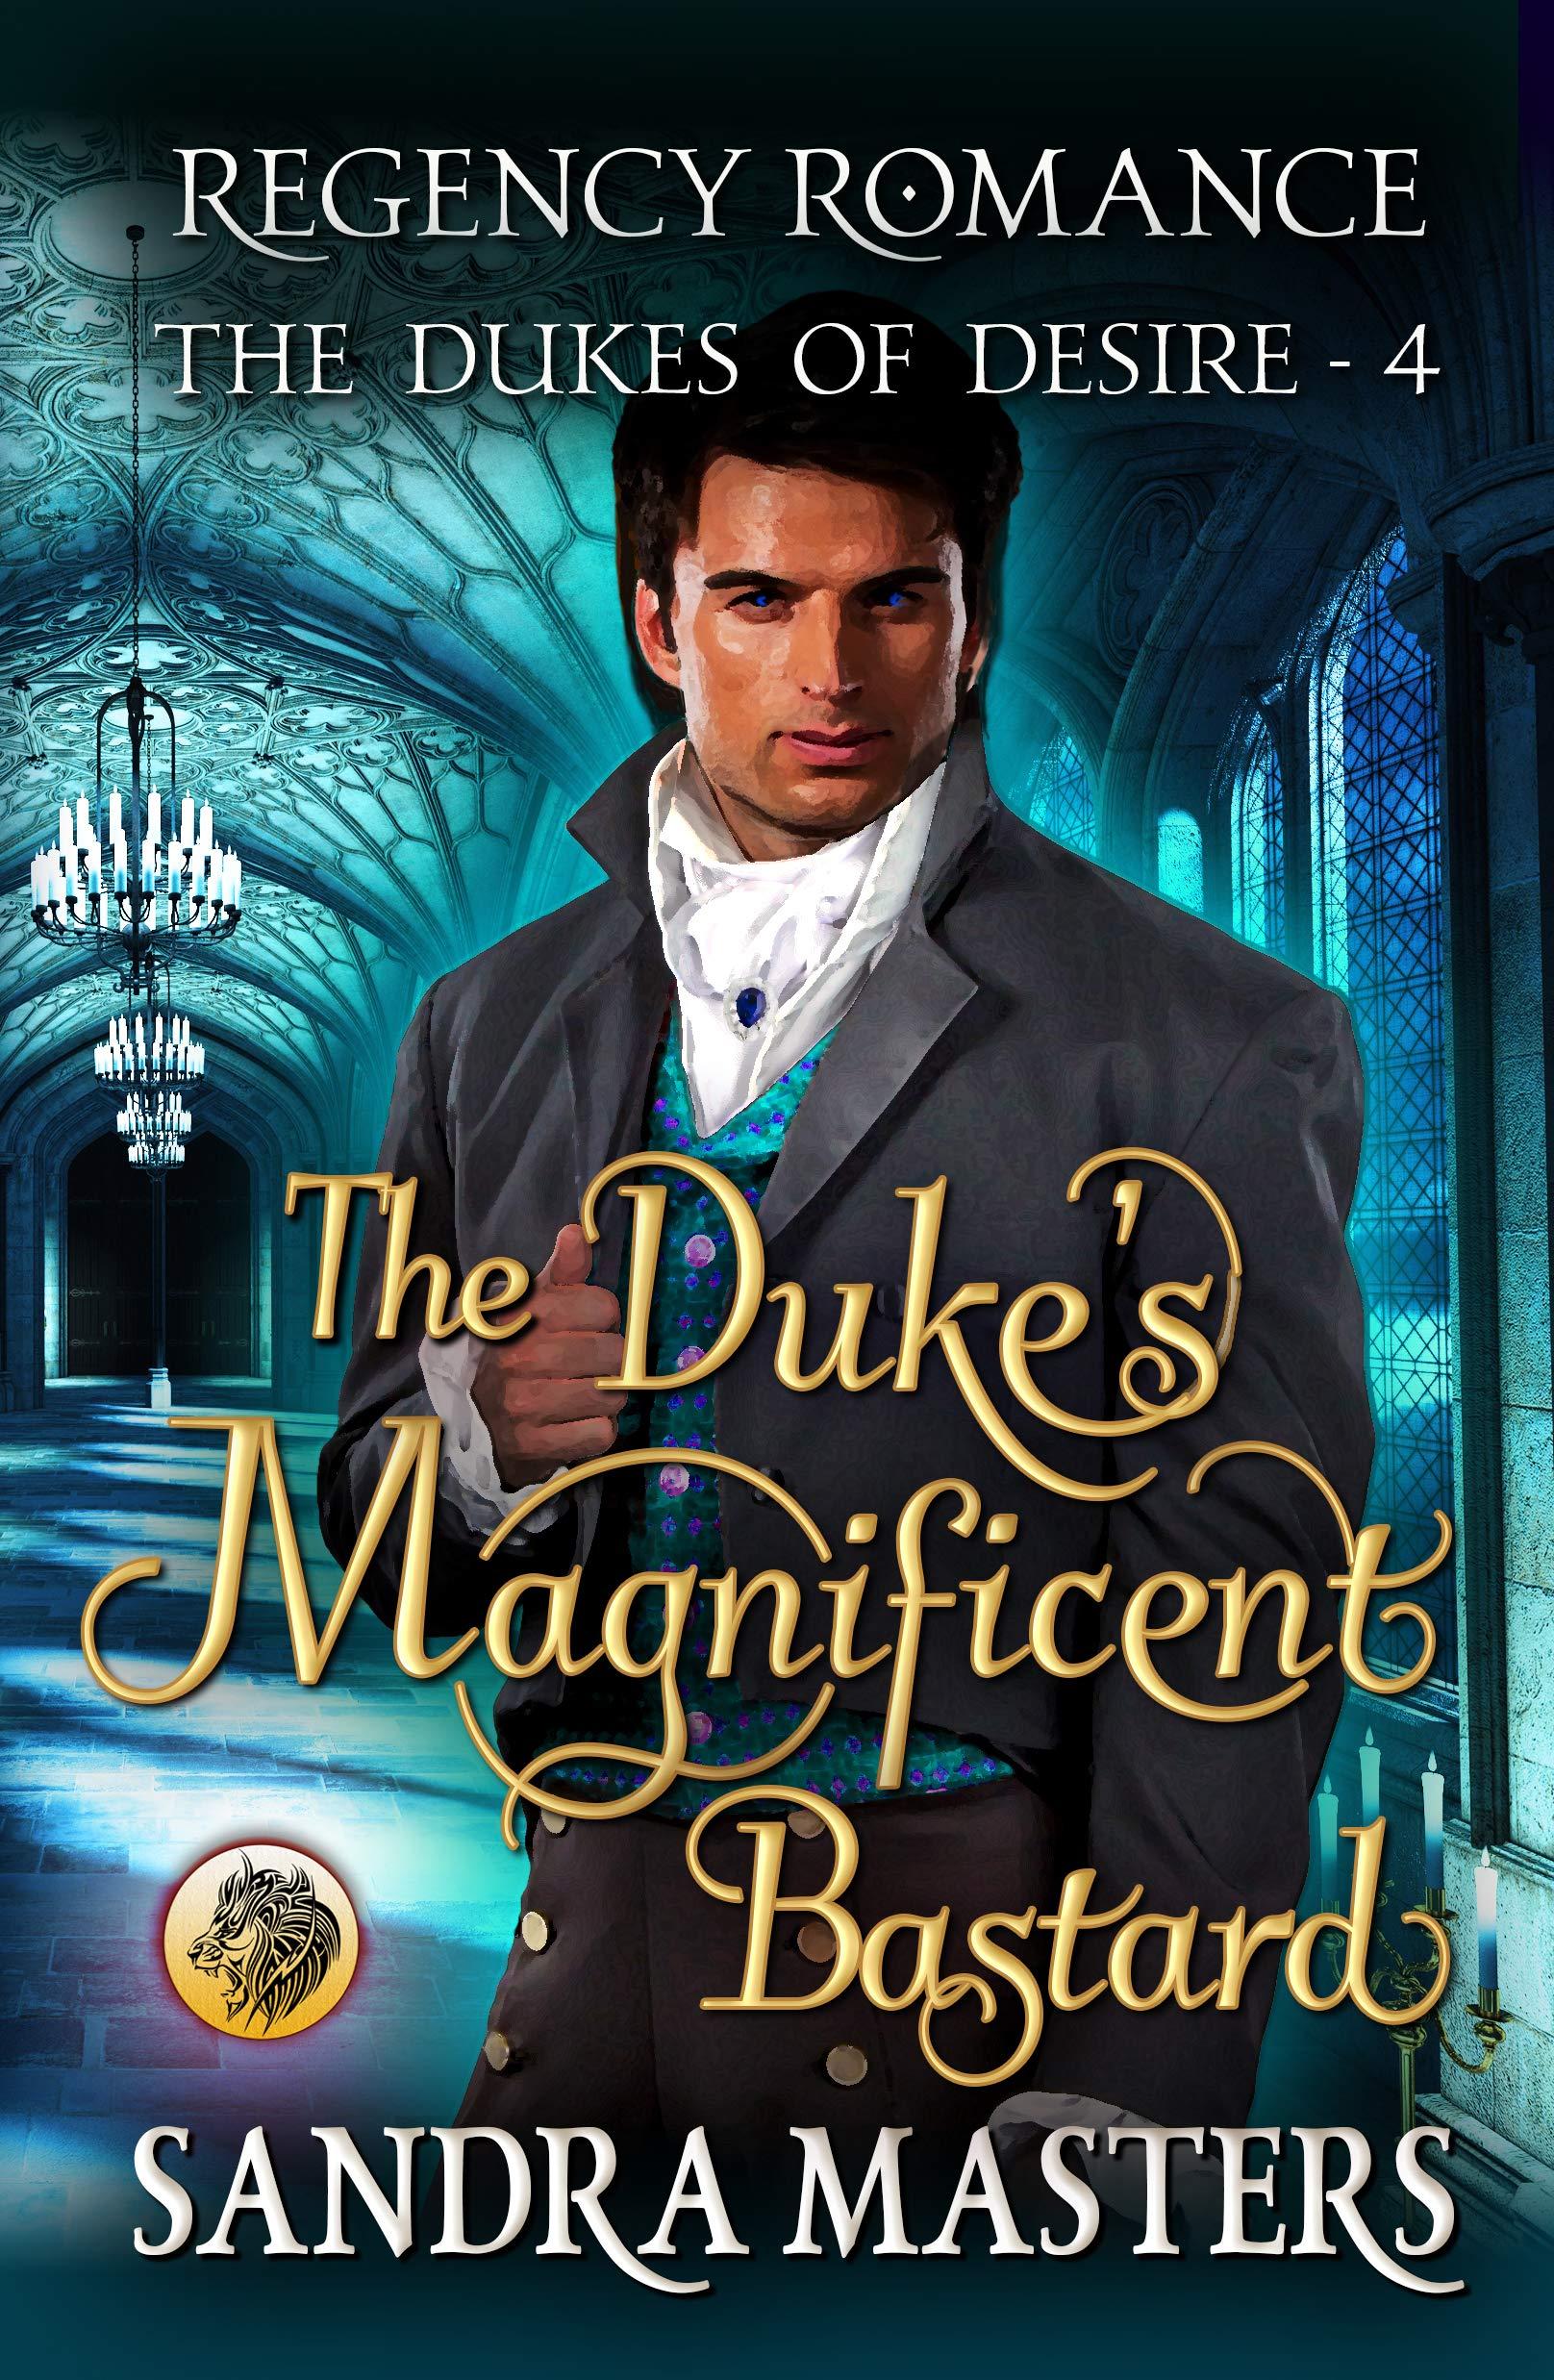 The Duke's Magnificent Bastard: Regency Romance (The Dukes of Desire Book 4)